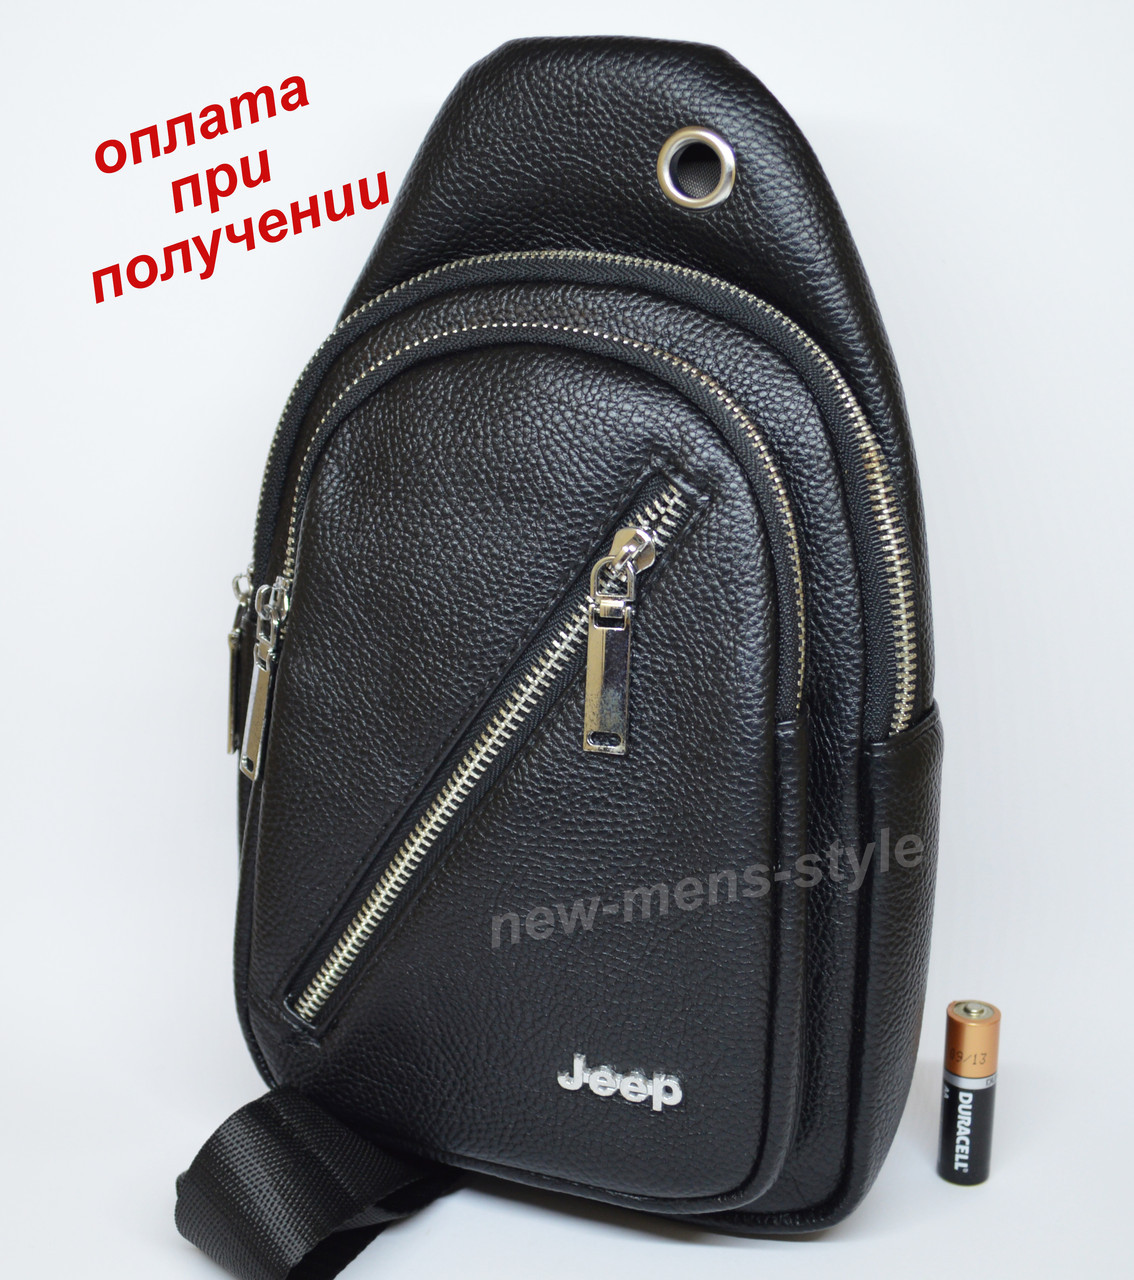 7b2b9cb06682 Мужская спортивная кожаная сумка слинг рюкзак бананка через плечо Jeep